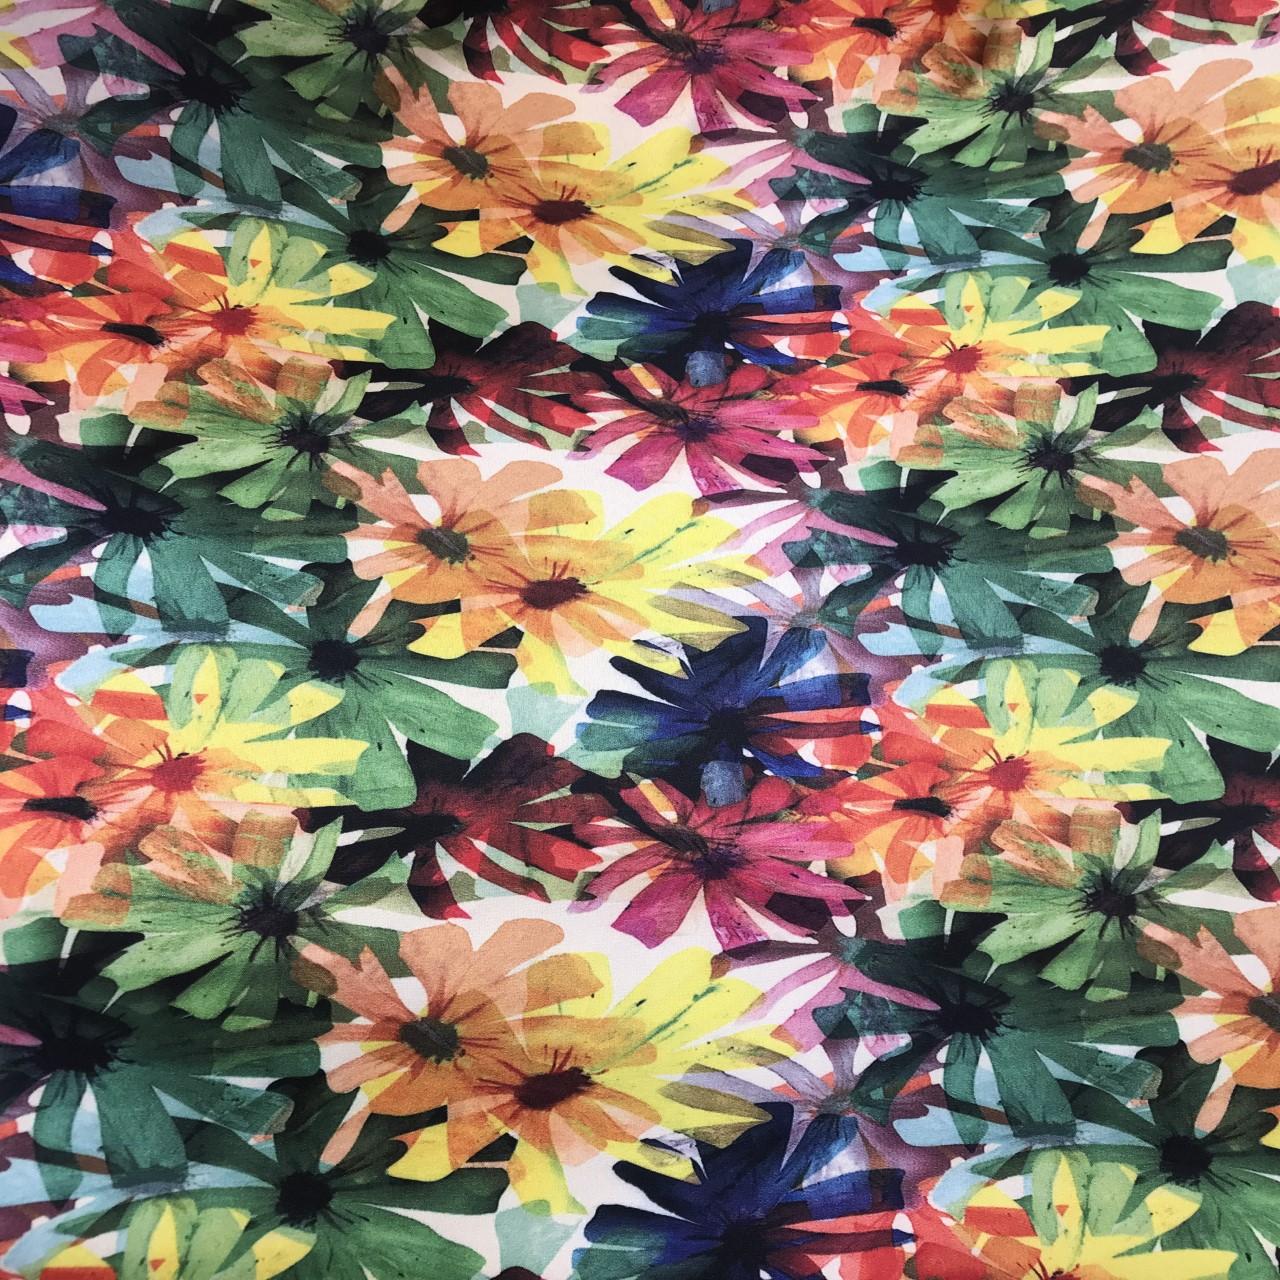 پارچه لباسی طرح گل آبرنگی کد 1018